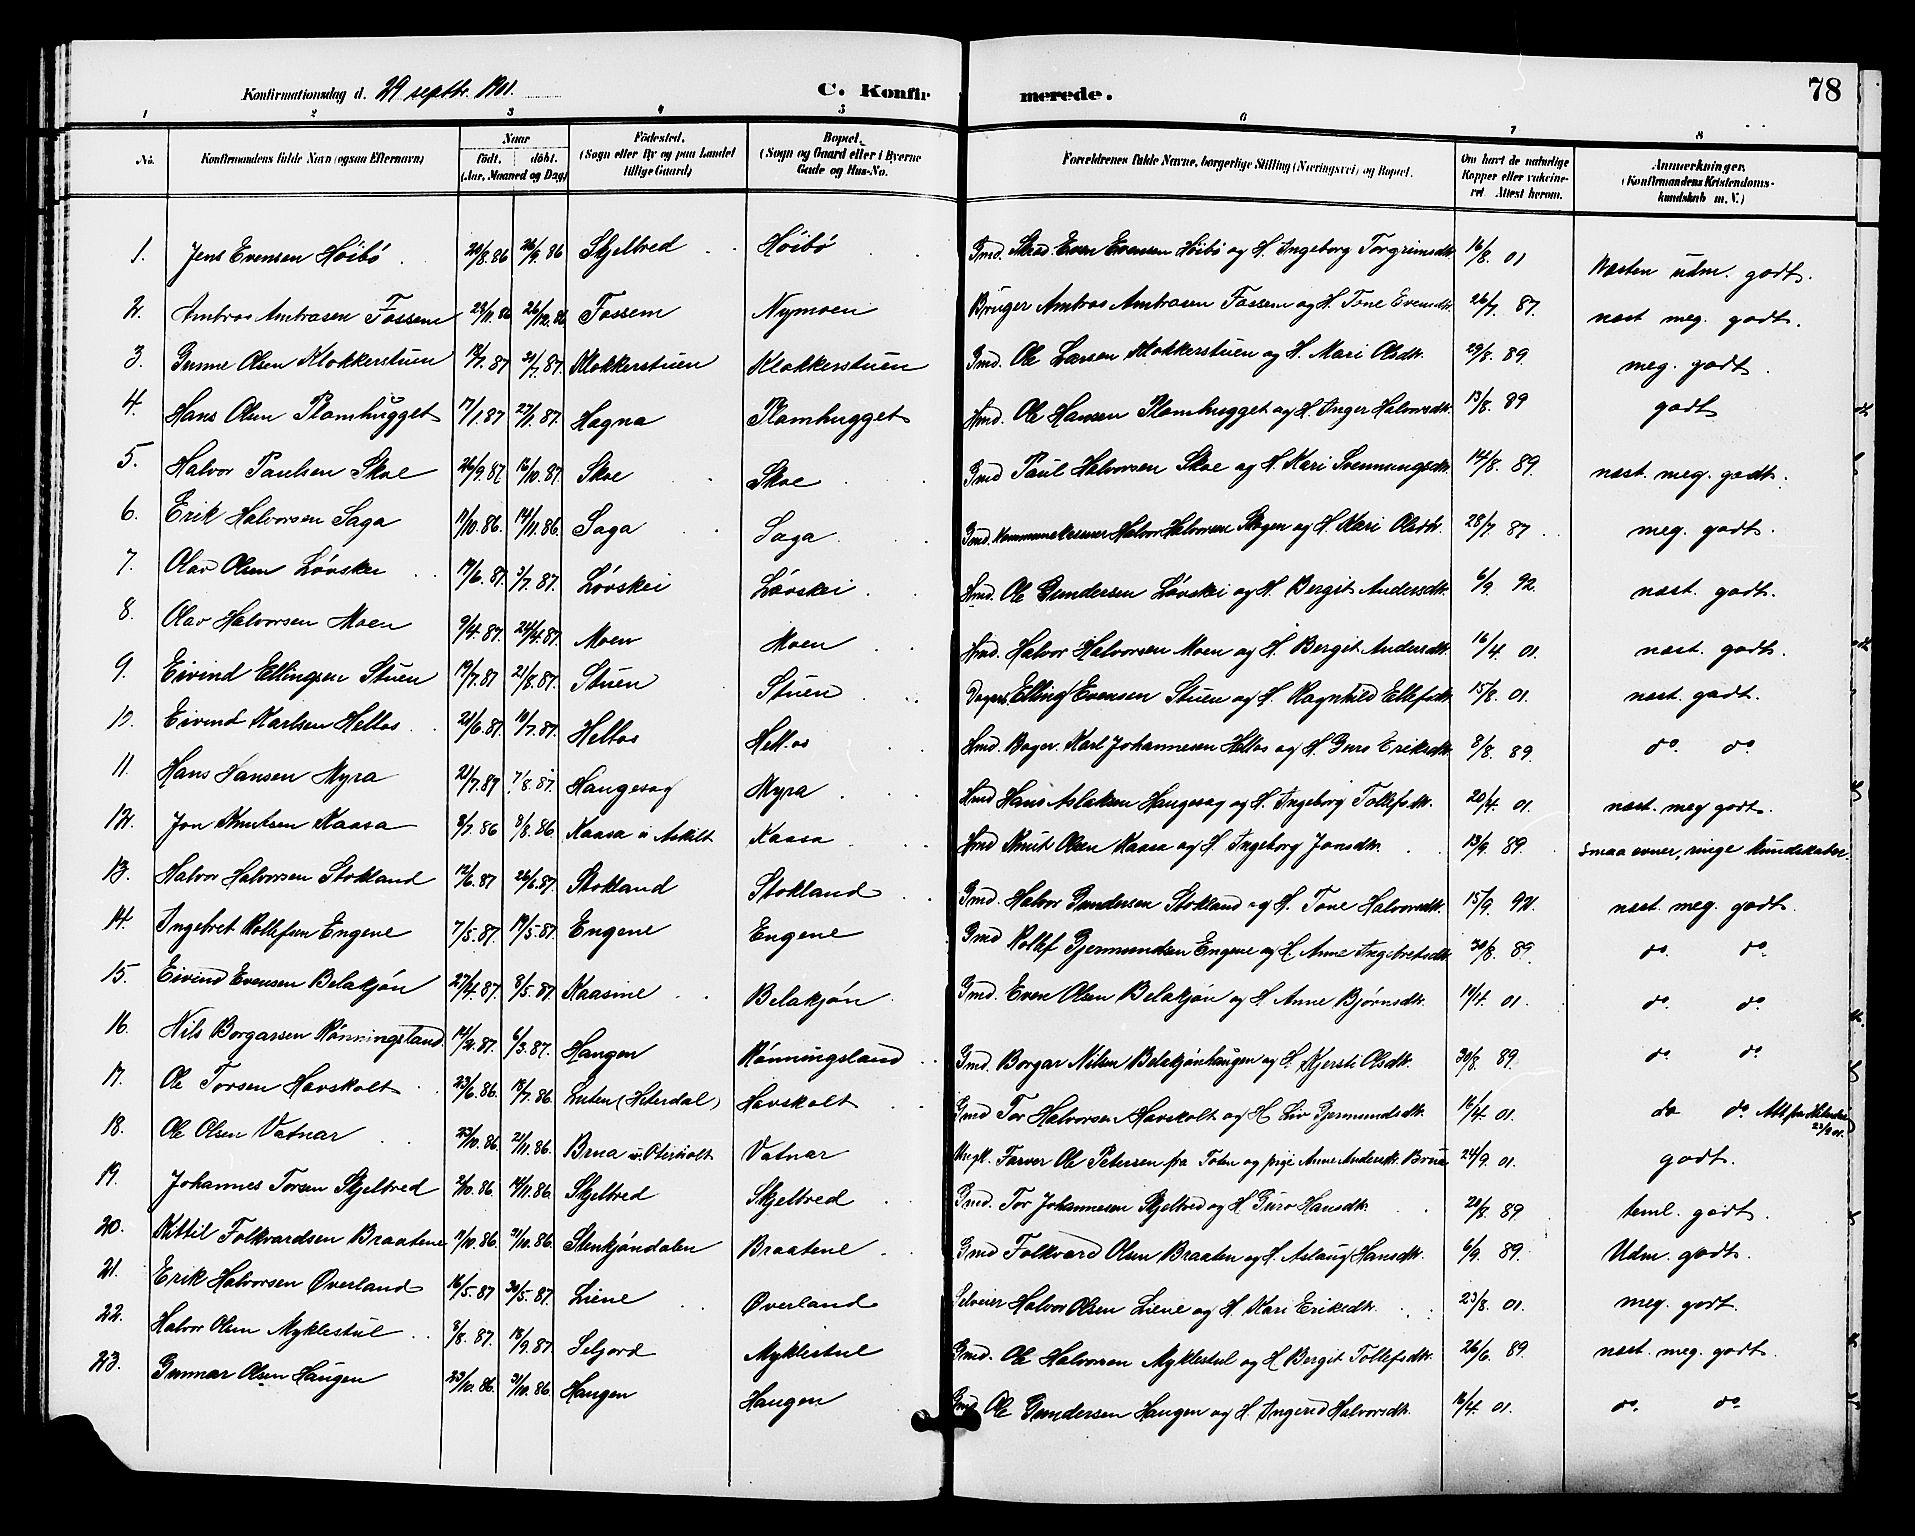 SAKO, Bø kirkebøker, G/Ga/L0006: Klokkerbok nr. 6, 1898-1909, s. 78